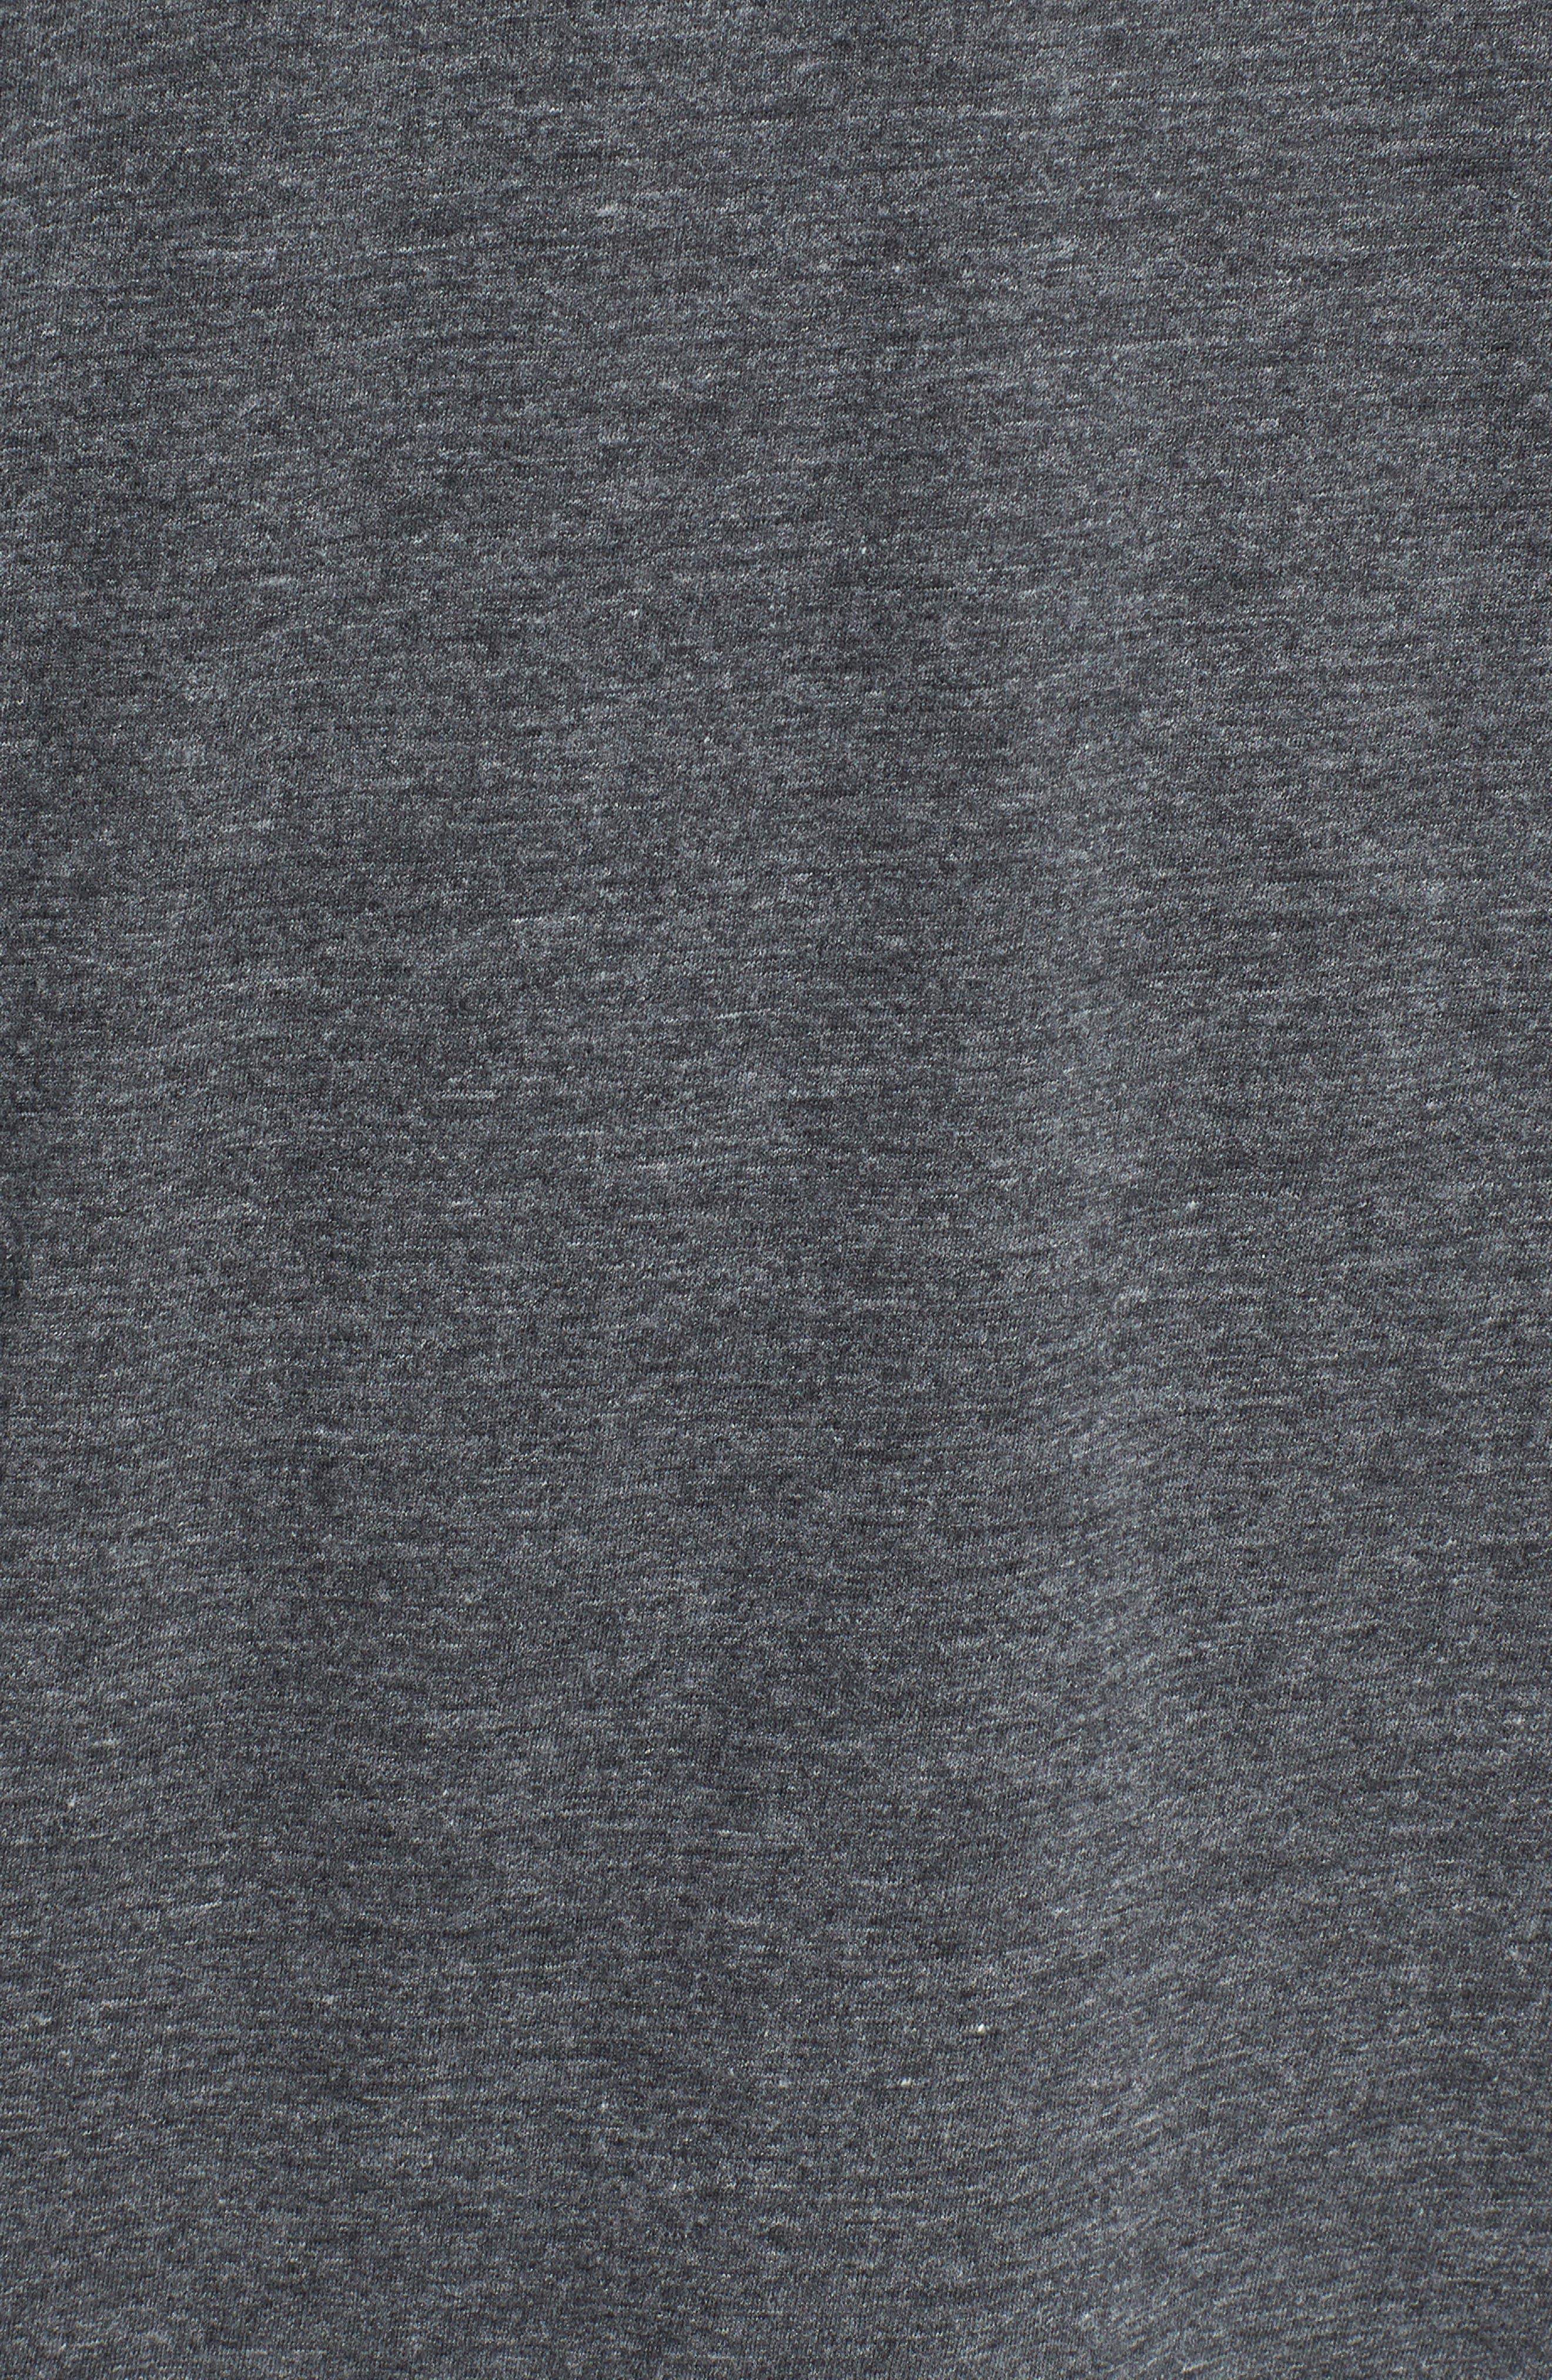 Cotton Blend Short Sleeve Henley,                             Alternate thumbnail 4, color,                             Anthracite